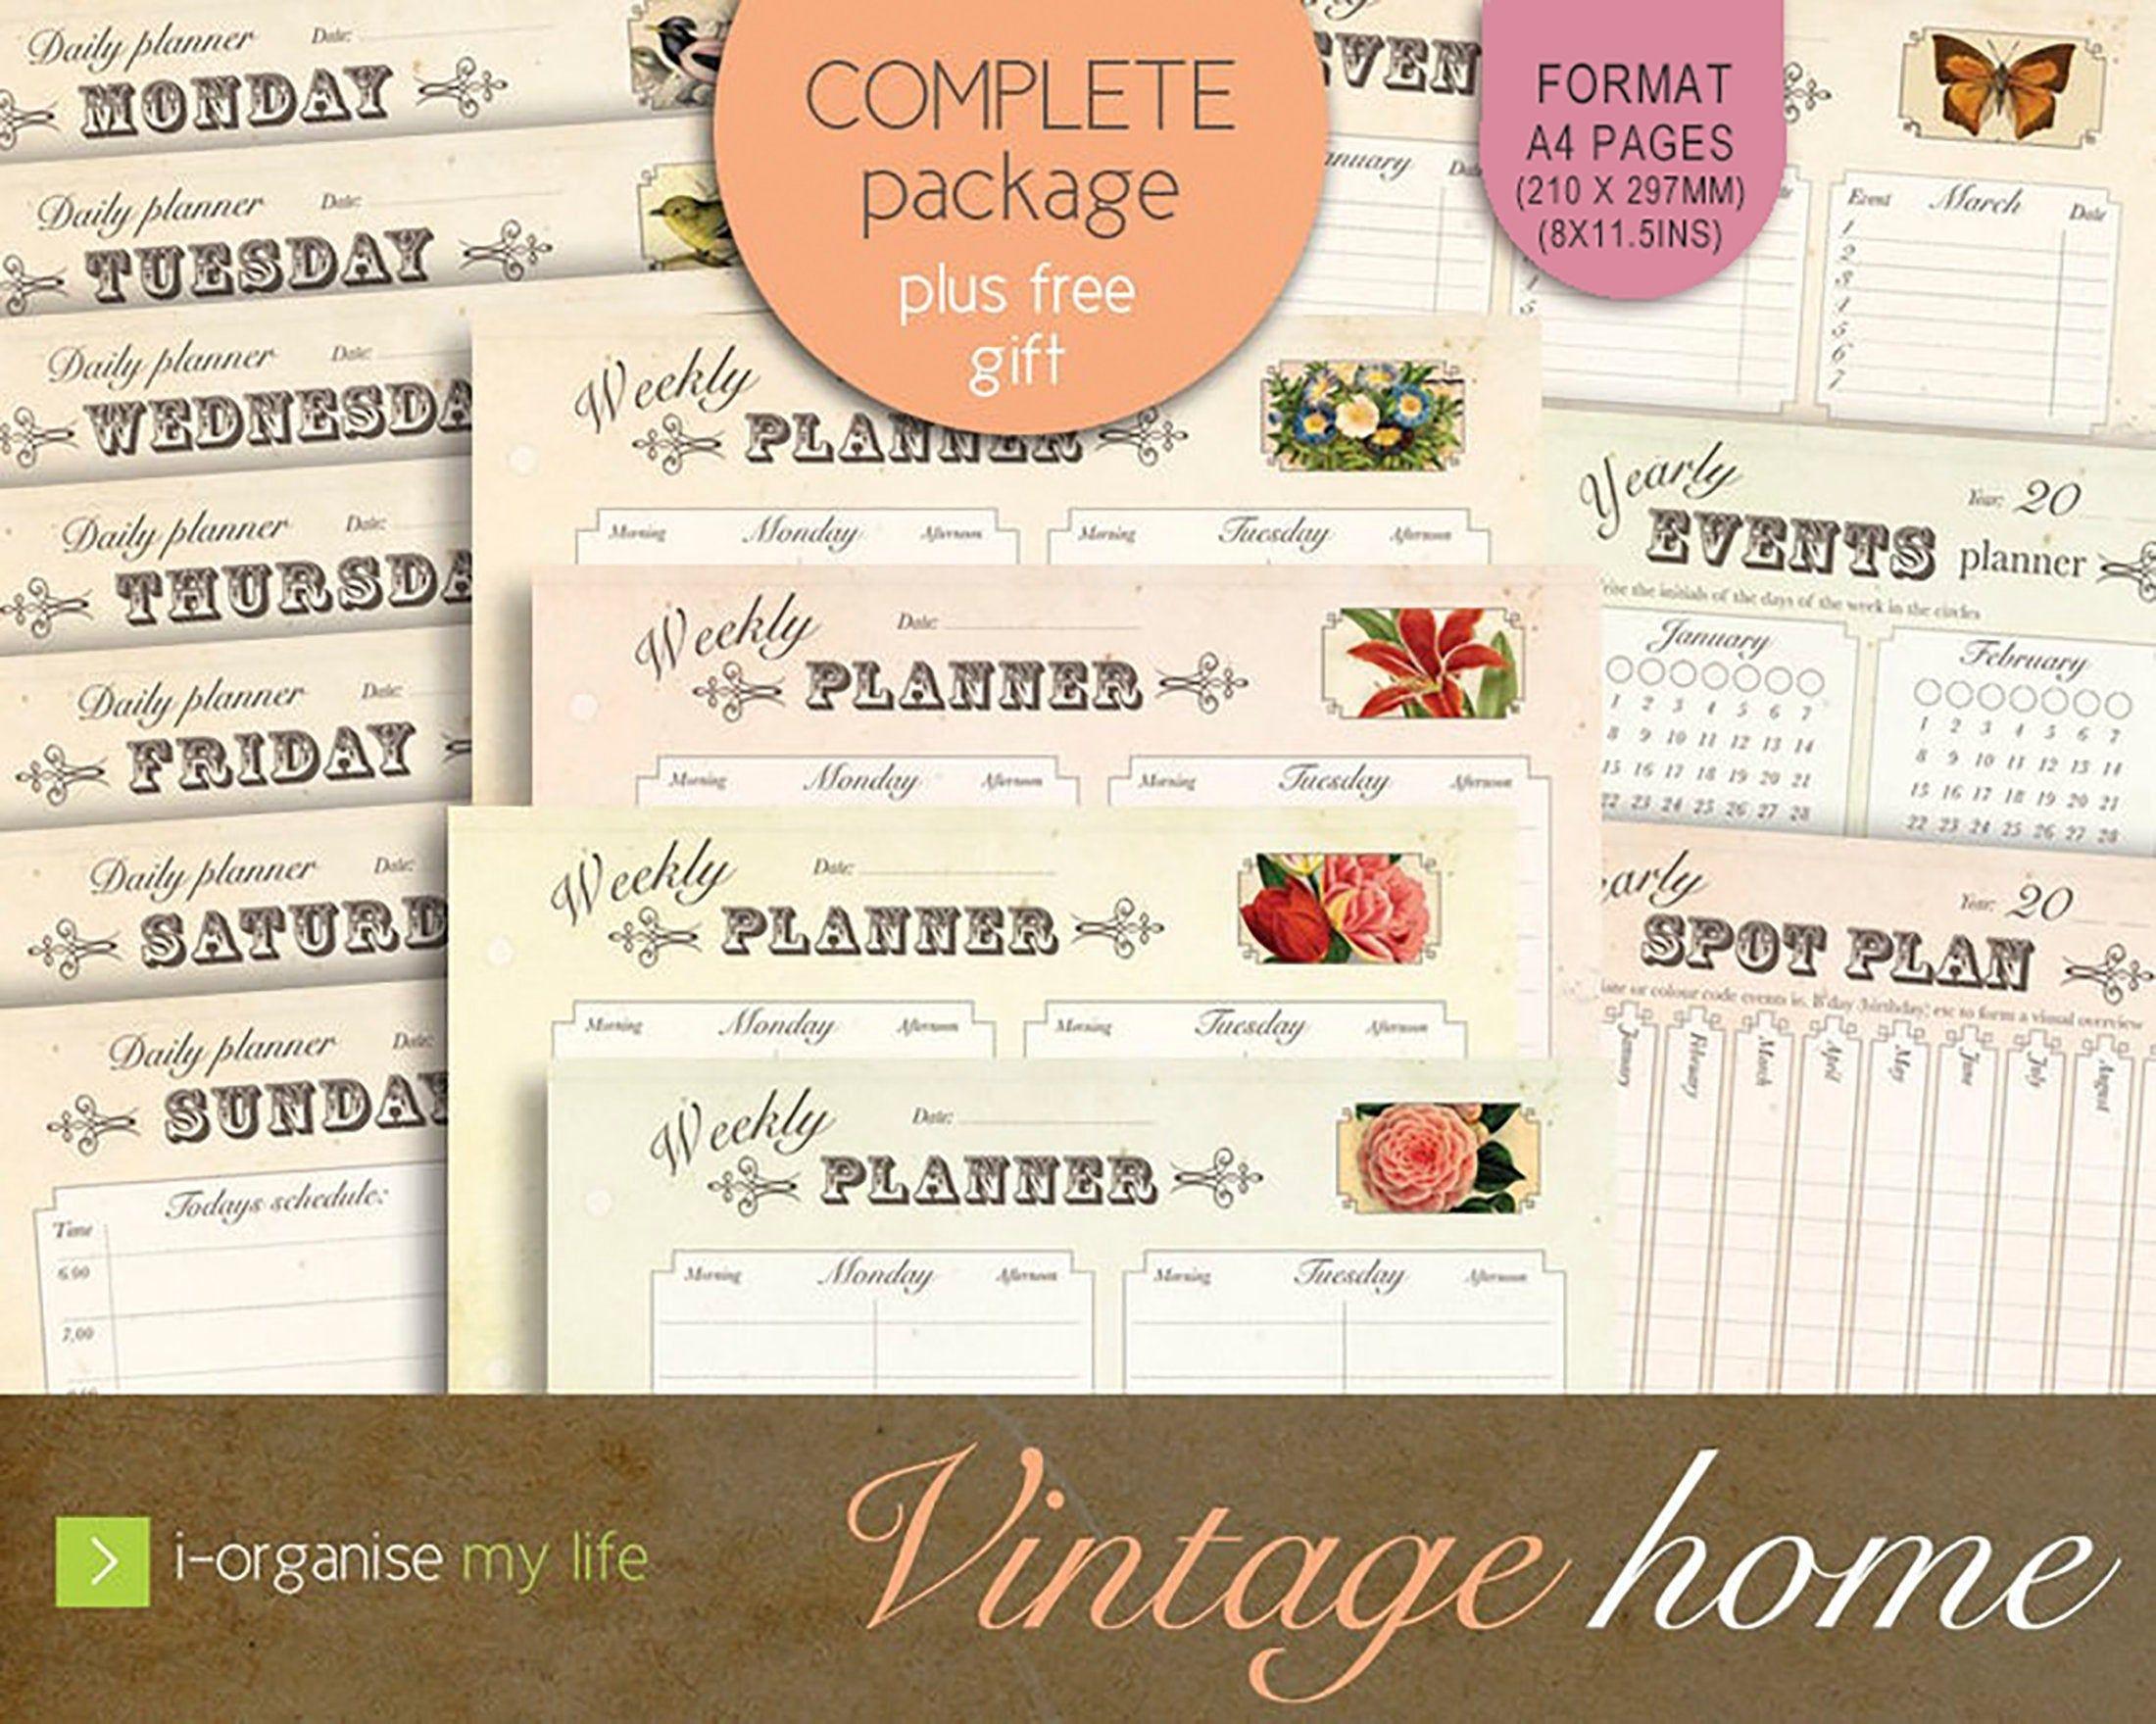 Planner Pack Digital Files Downloadable Printable Daily Planner Week  Planner Year Planner Schedule Planner Event Planner